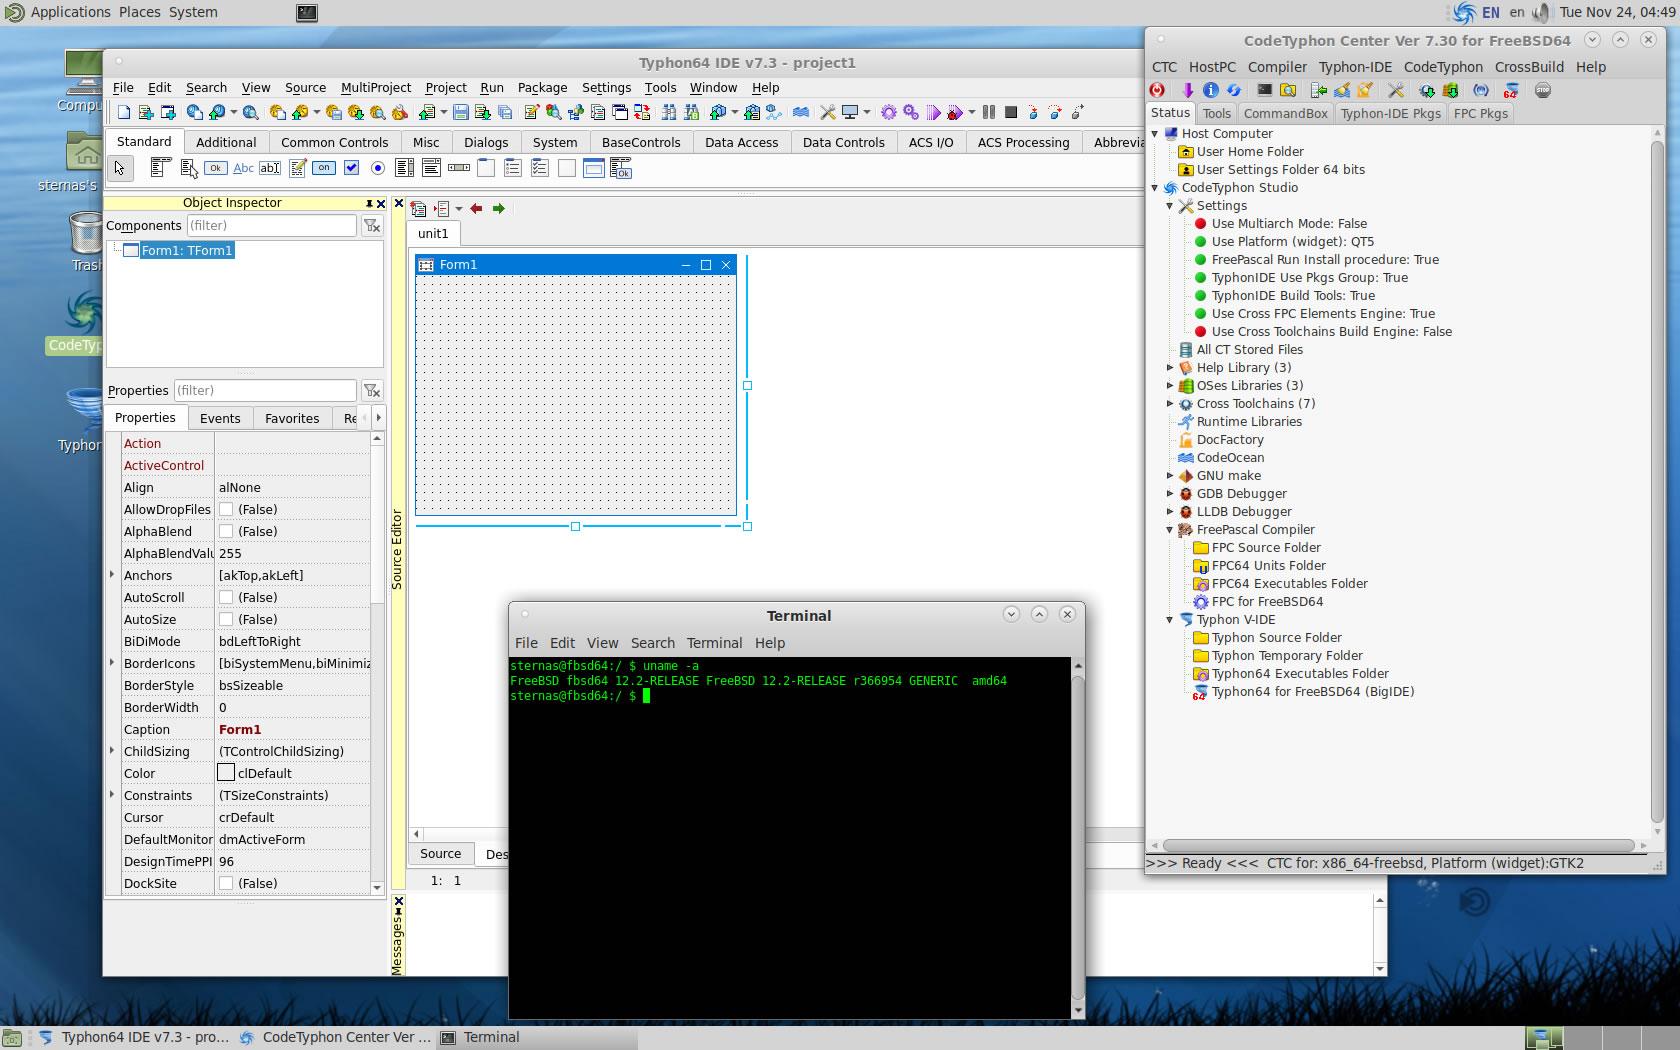 FreeBSD64-122.jpg